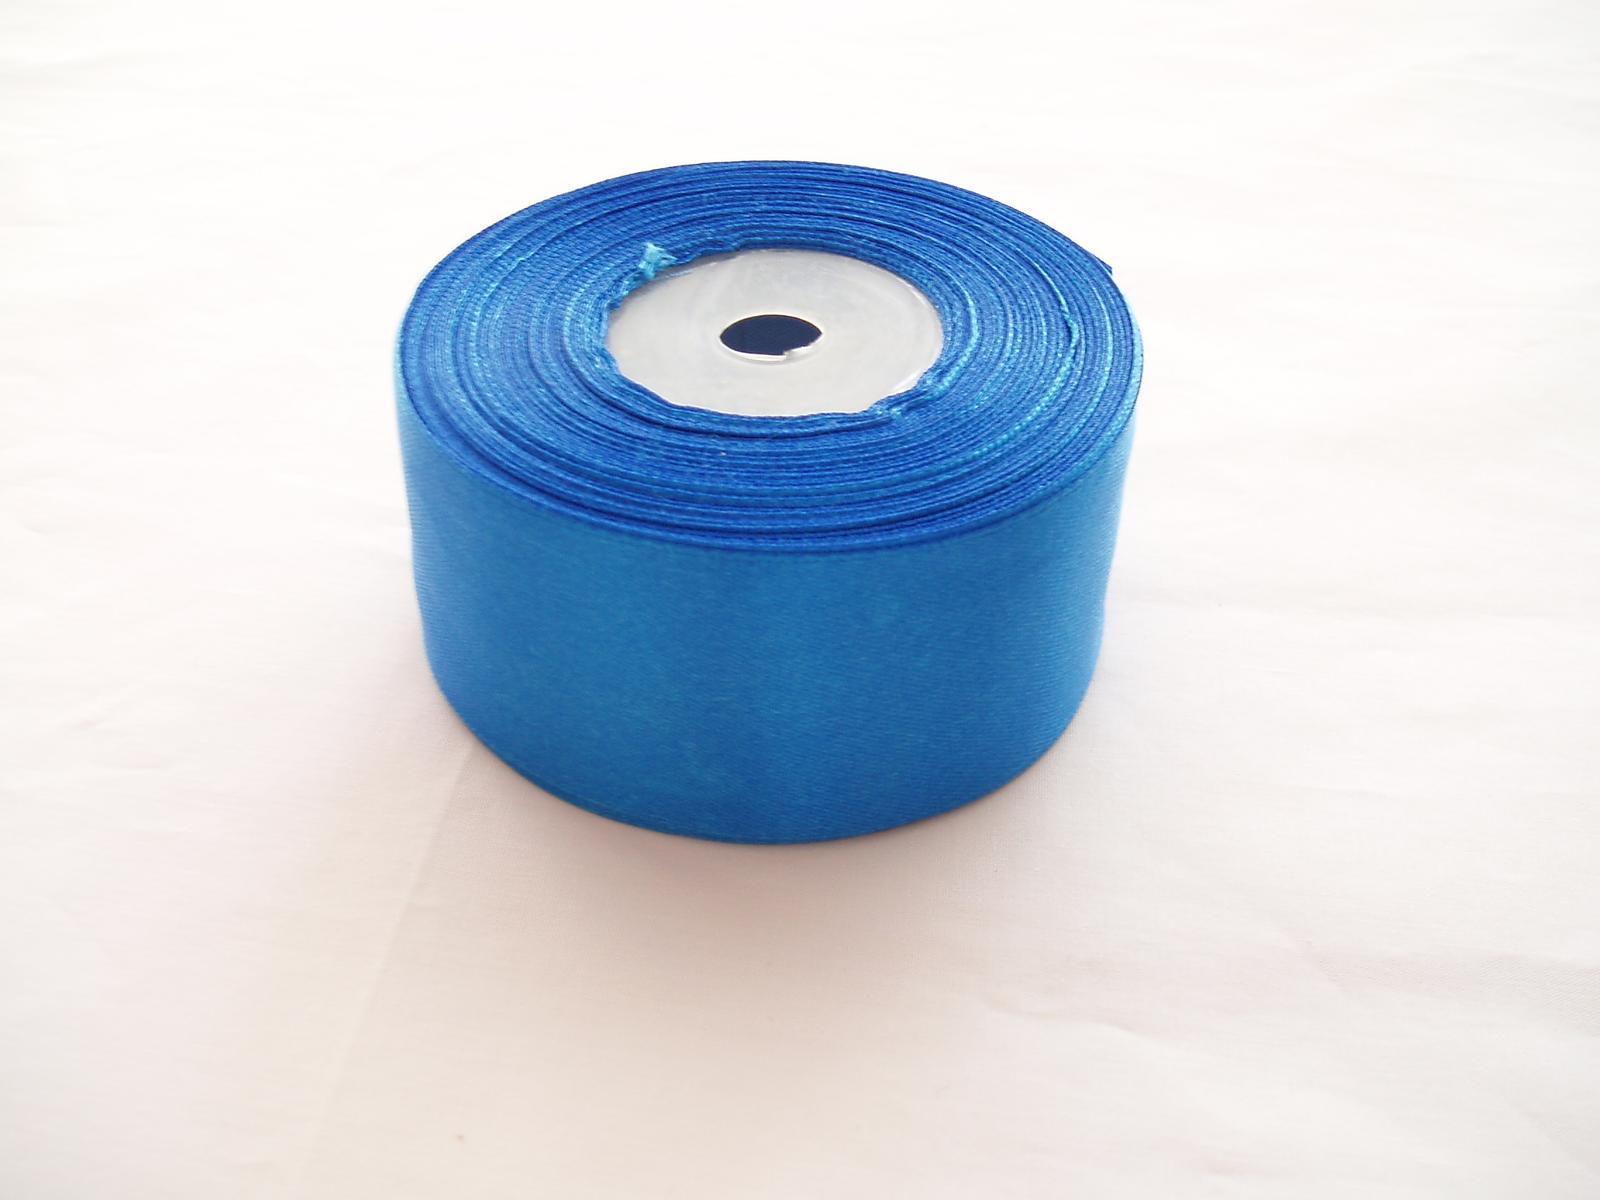 saténová stuha modrá-4cm - Obrázek č. 1